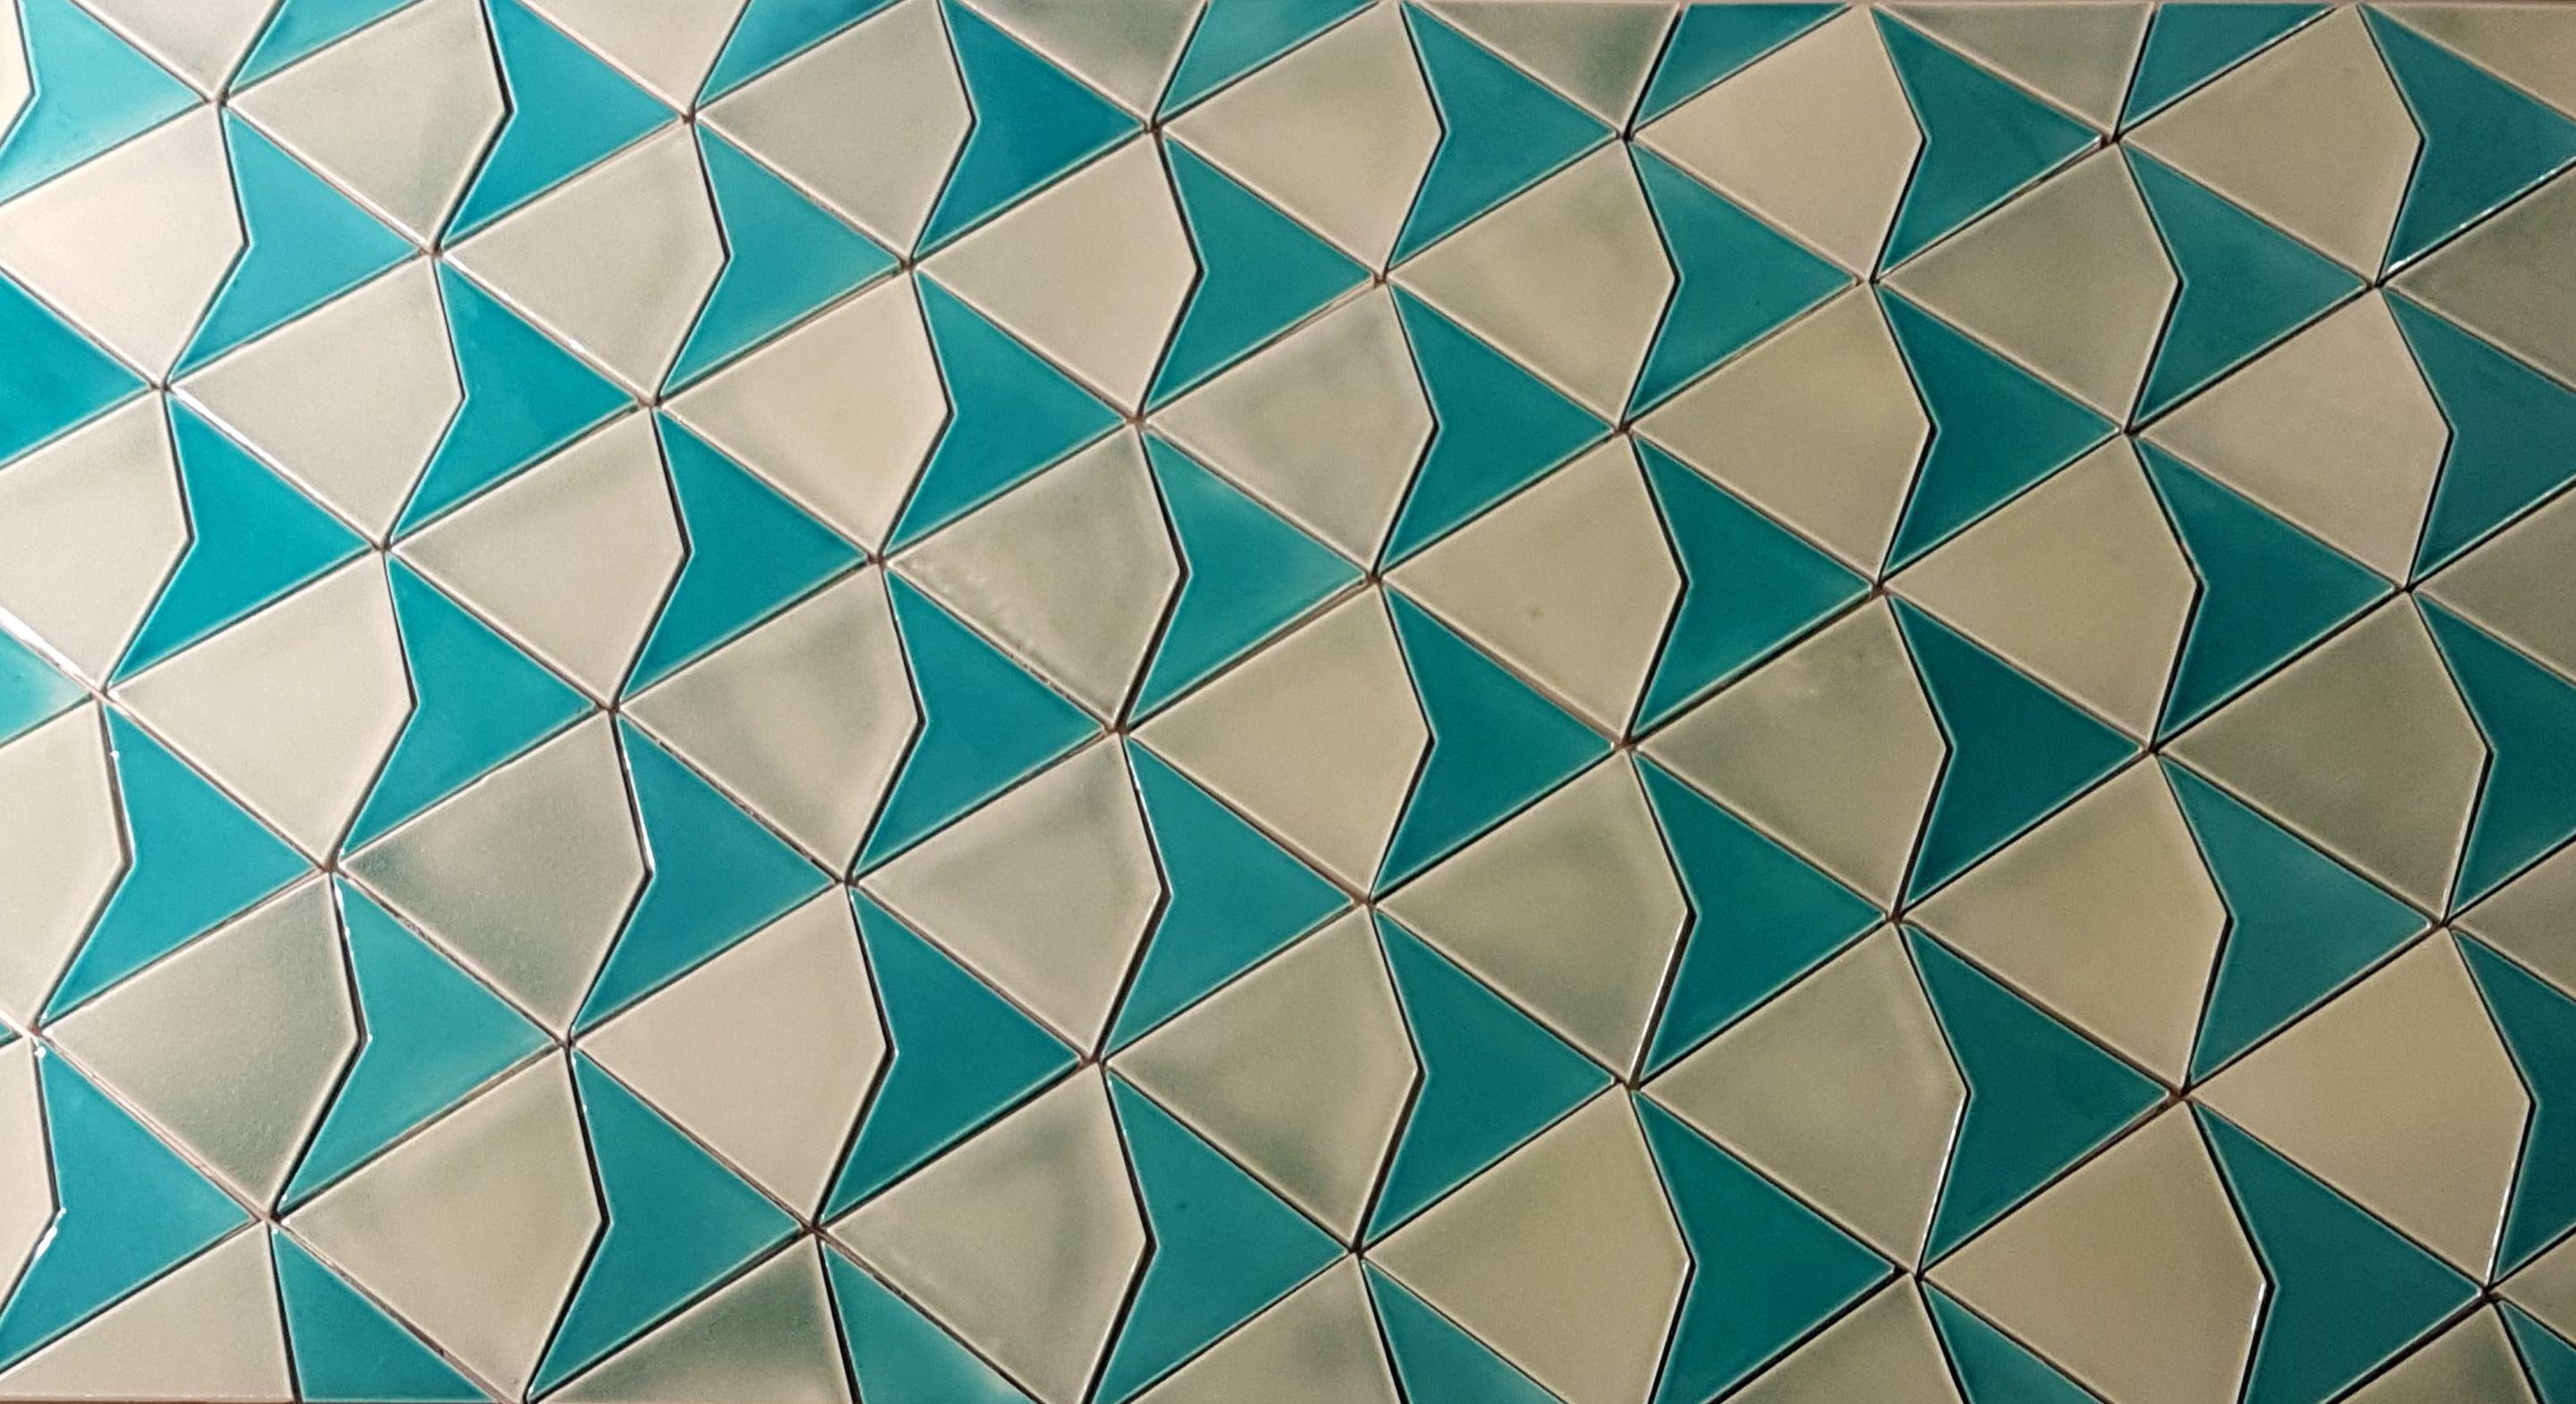 Carrelage retro art déco inspiration Penrose fleche cerf volant